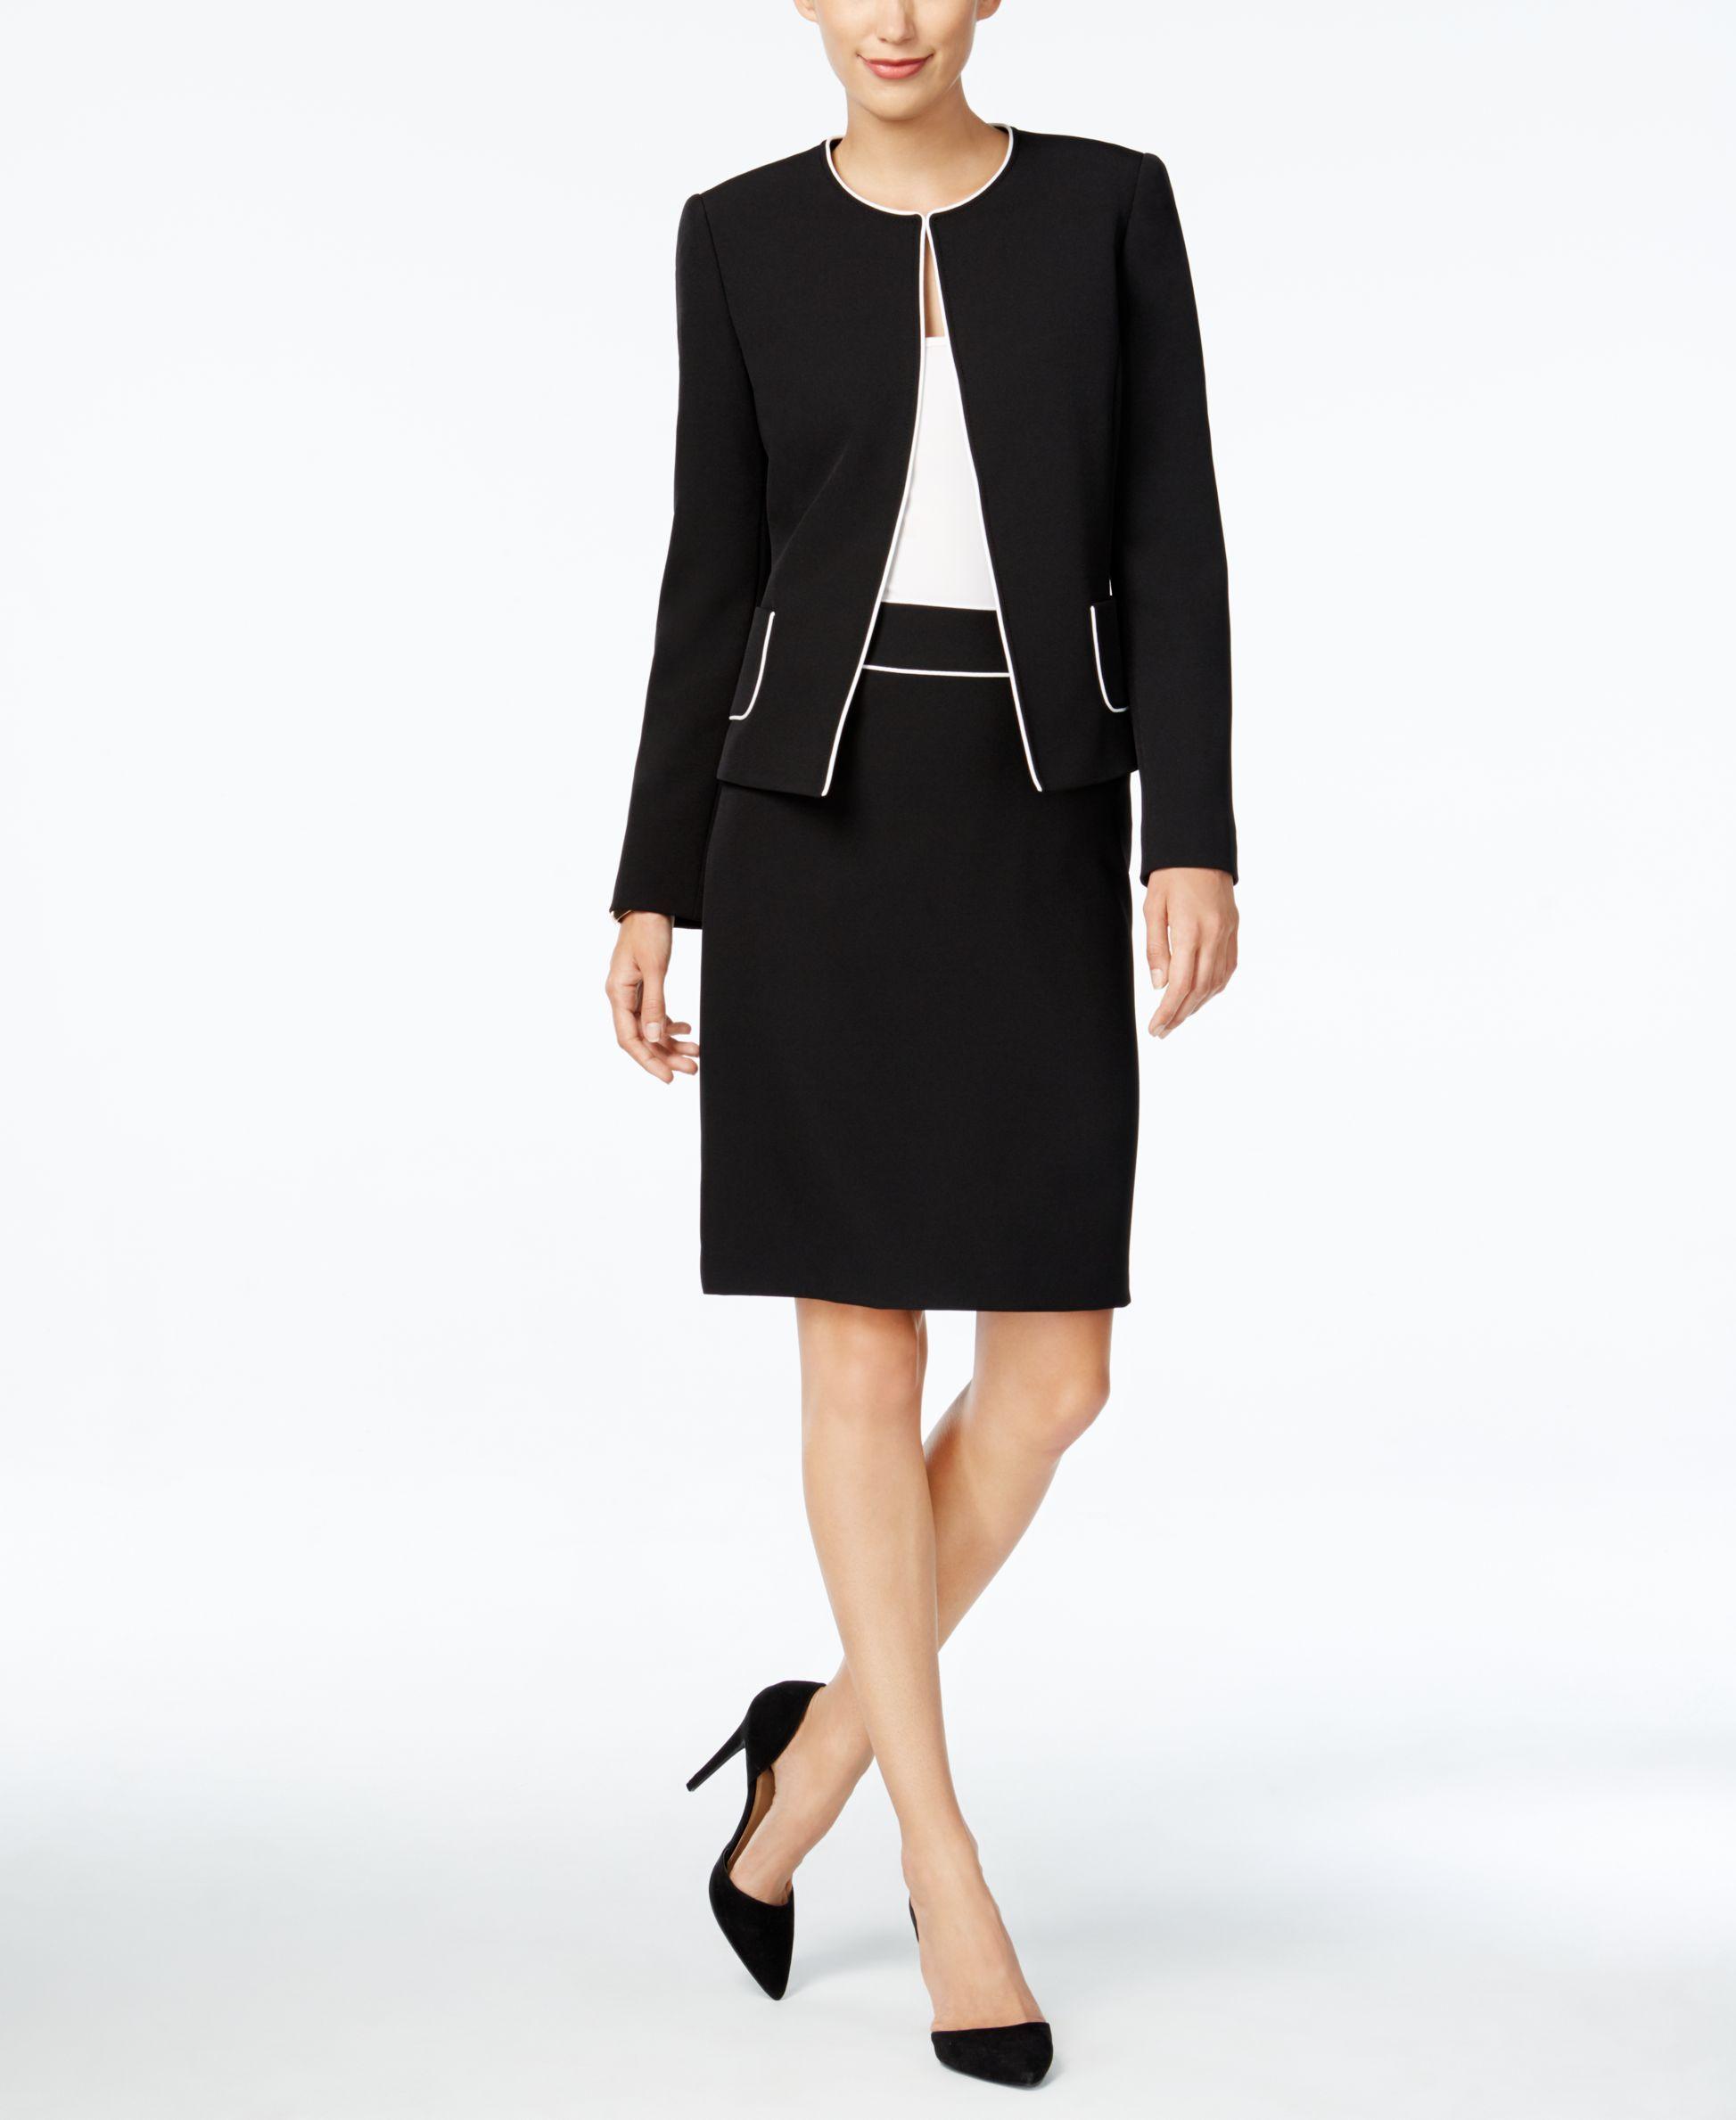 b4cbfacc78d Tahari Asl Petite Crepe Piped Skirt Suit | My Style in 2019 | Suits ...